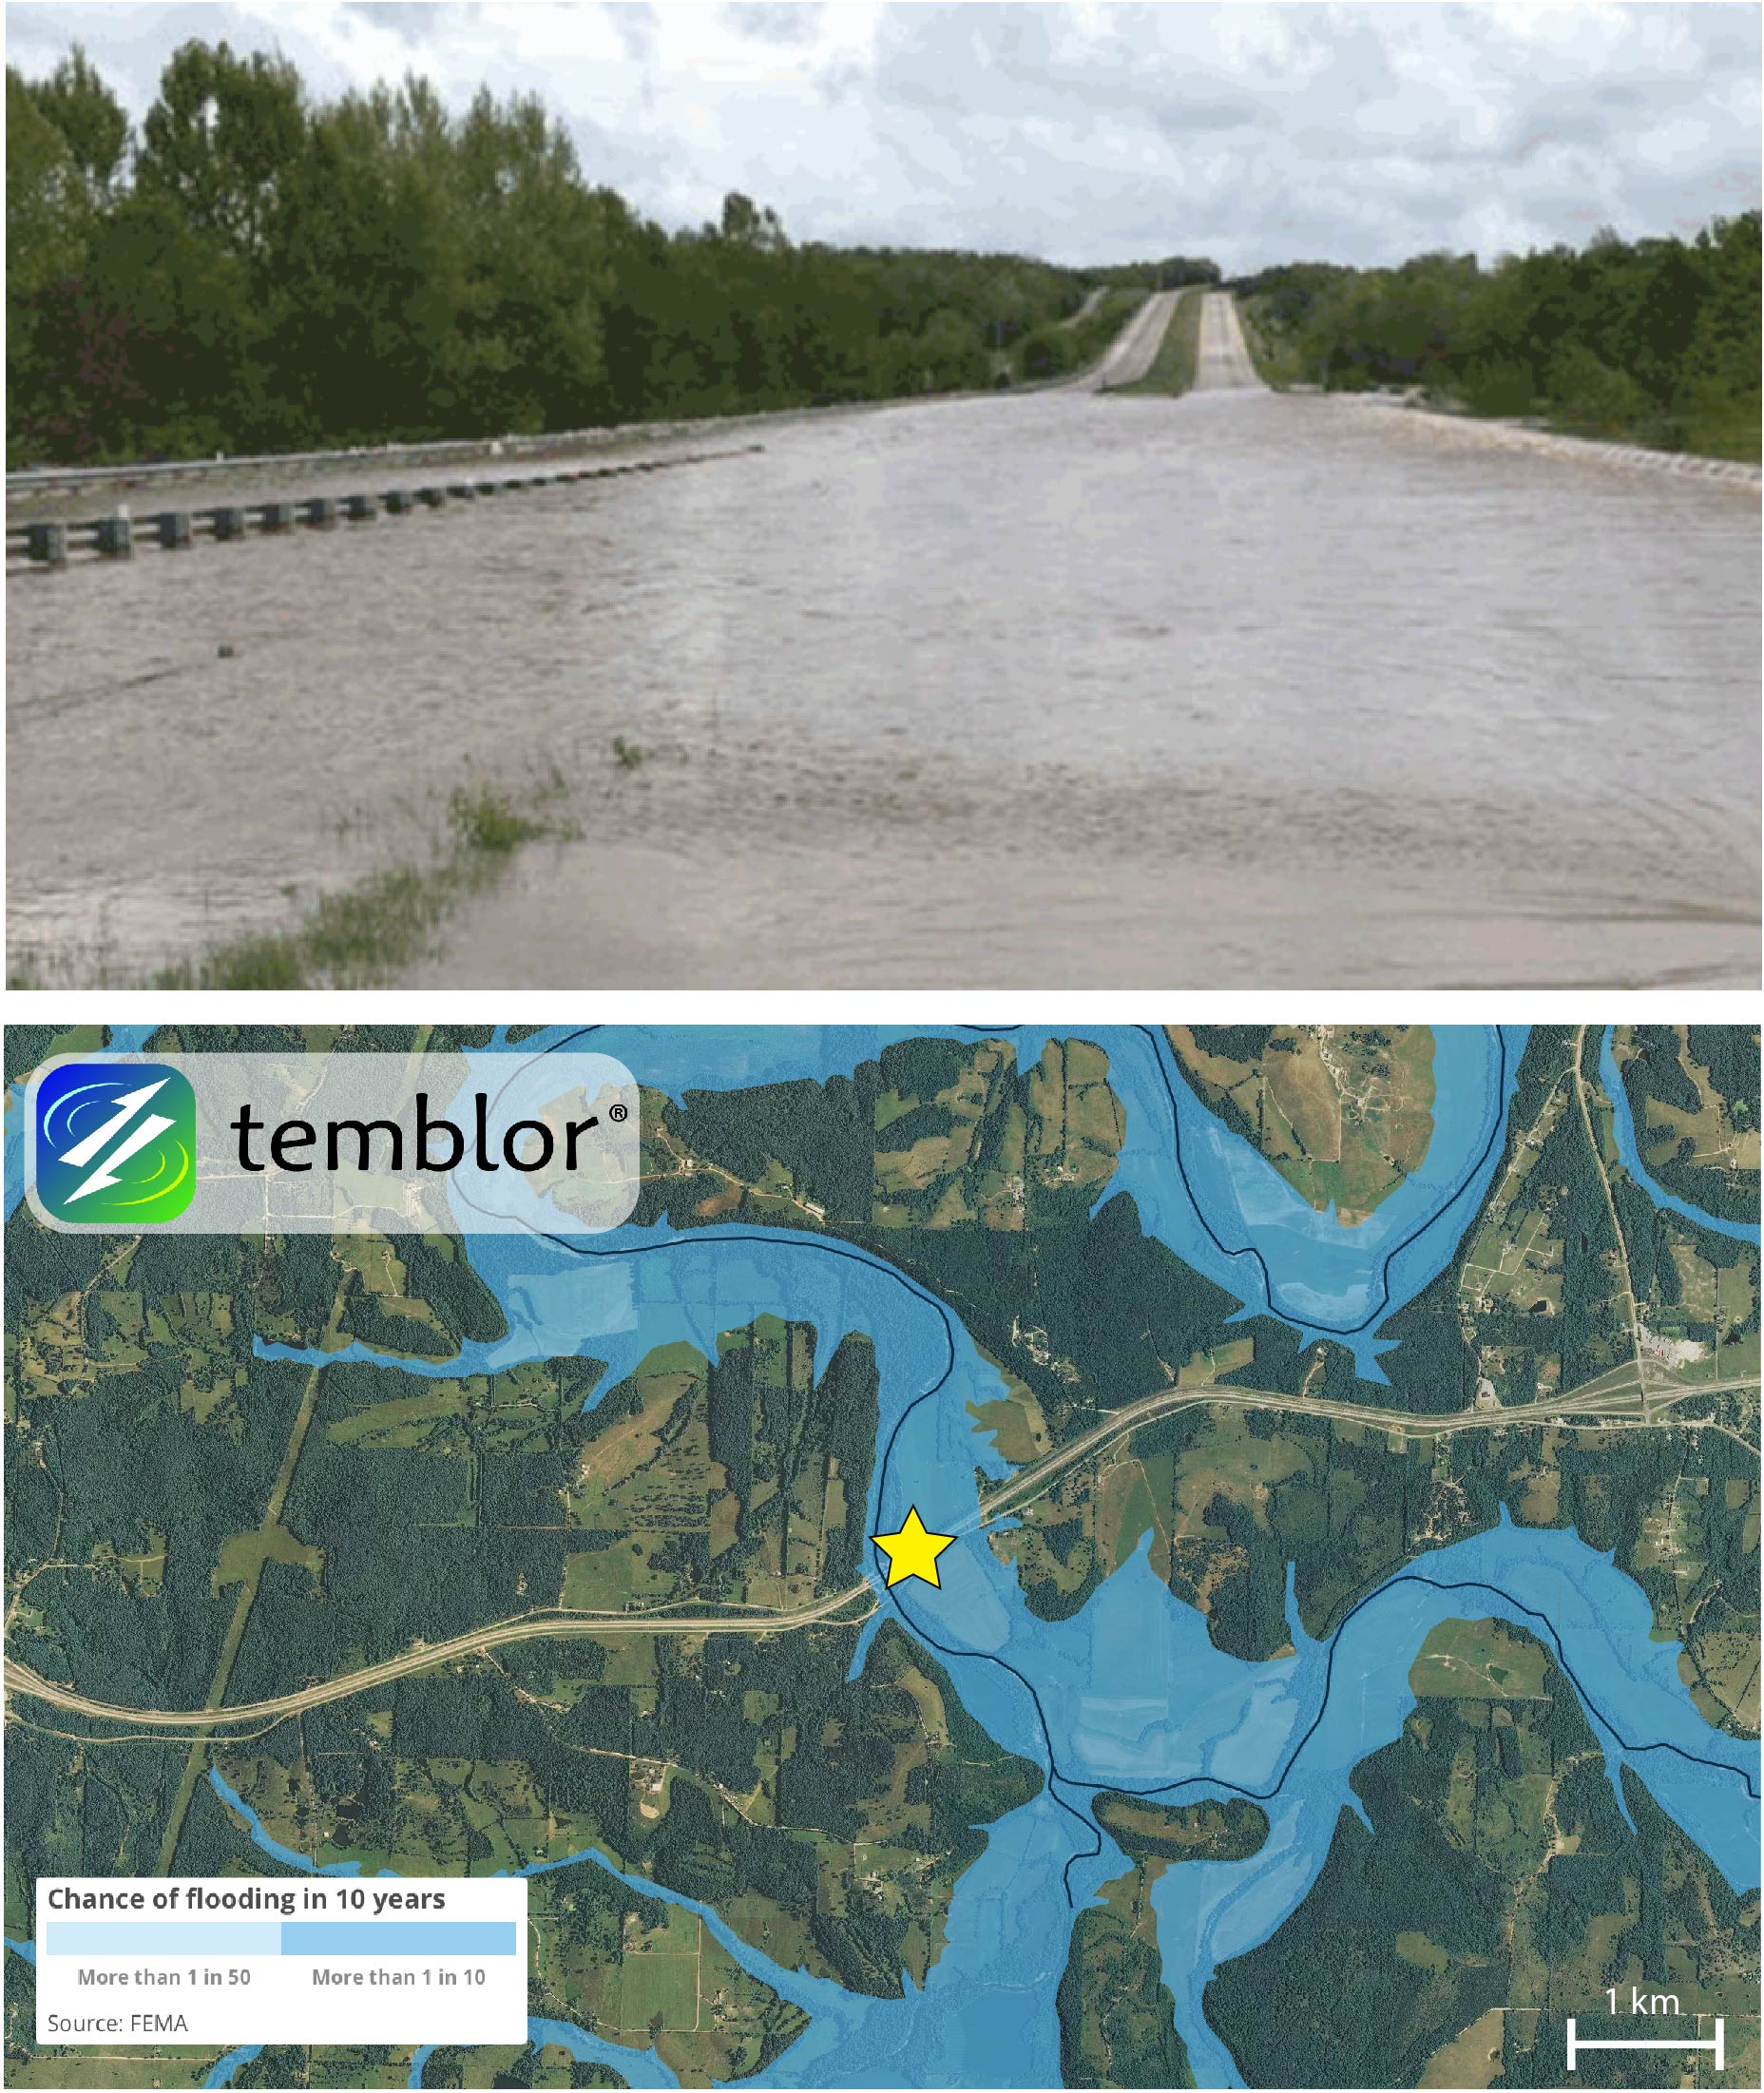 middwest-flooding-missouri-flood-map-fema-flood-map